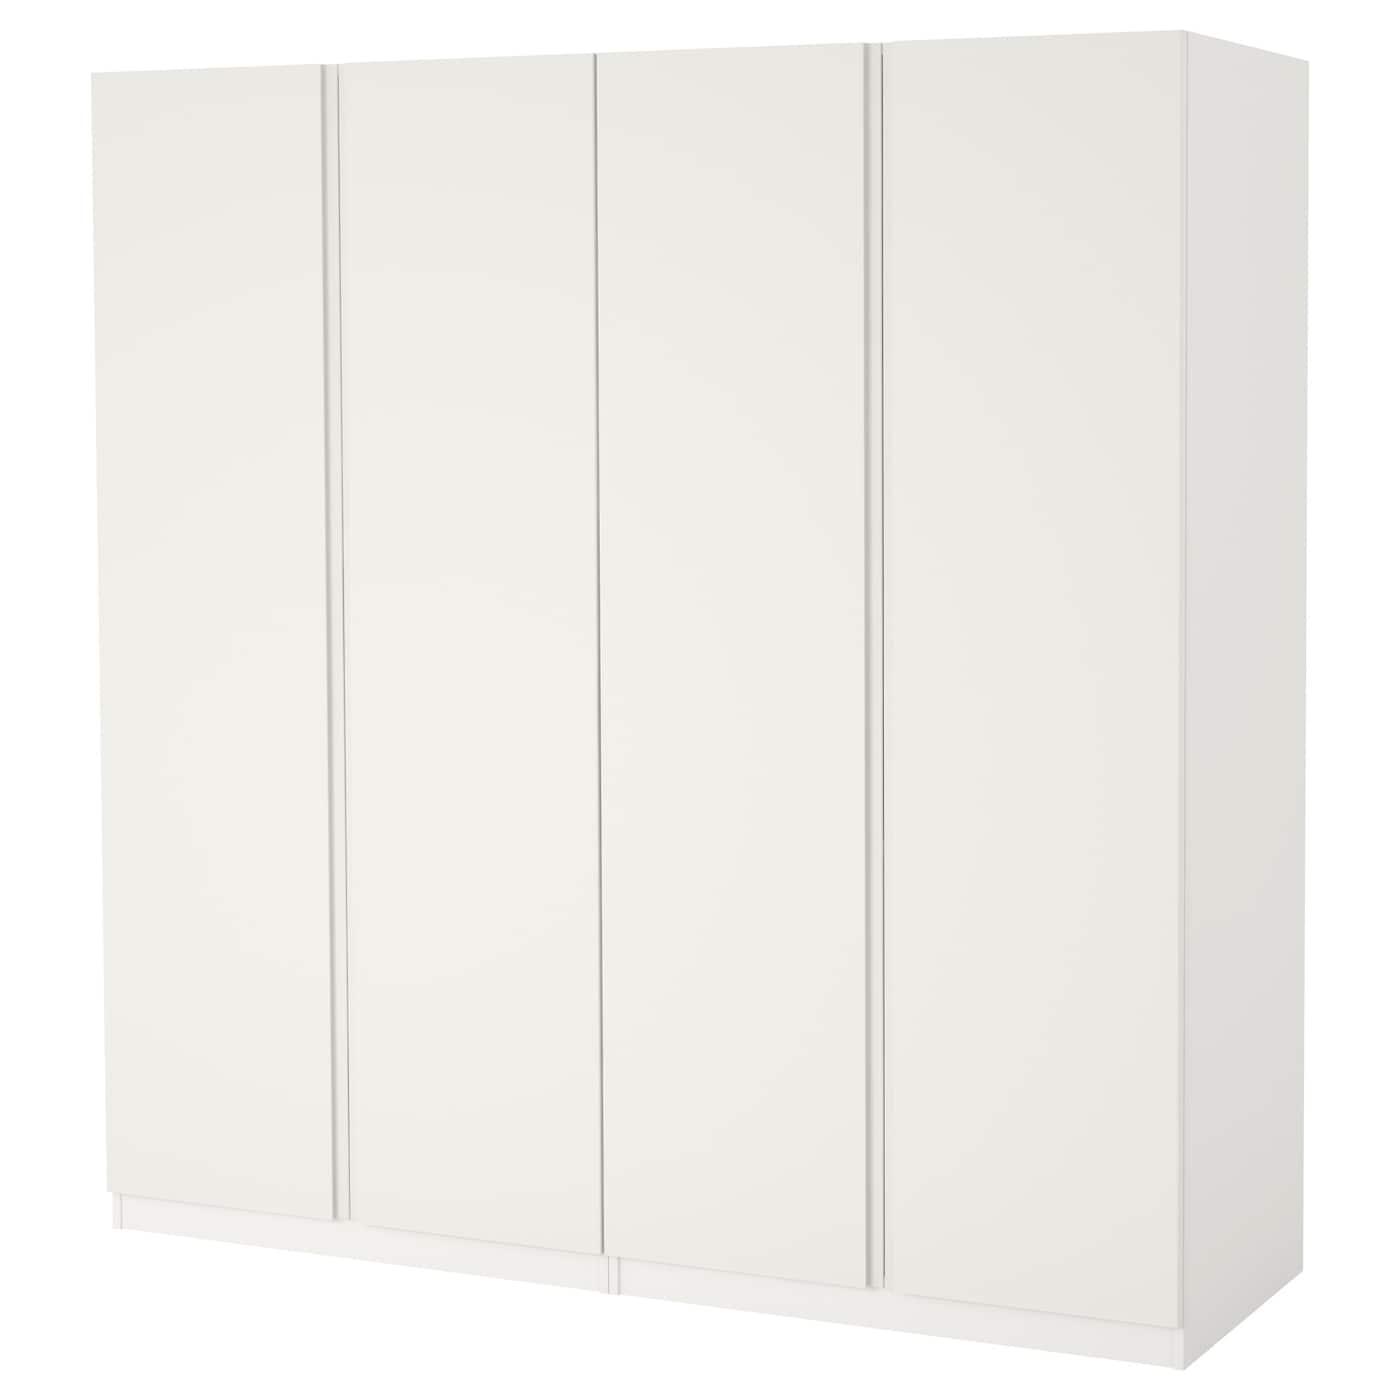 pax armoire penderie blanc vikanes blanc 200 x 60 x 201 cm. Black Bedroom Furniture Sets. Home Design Ideas